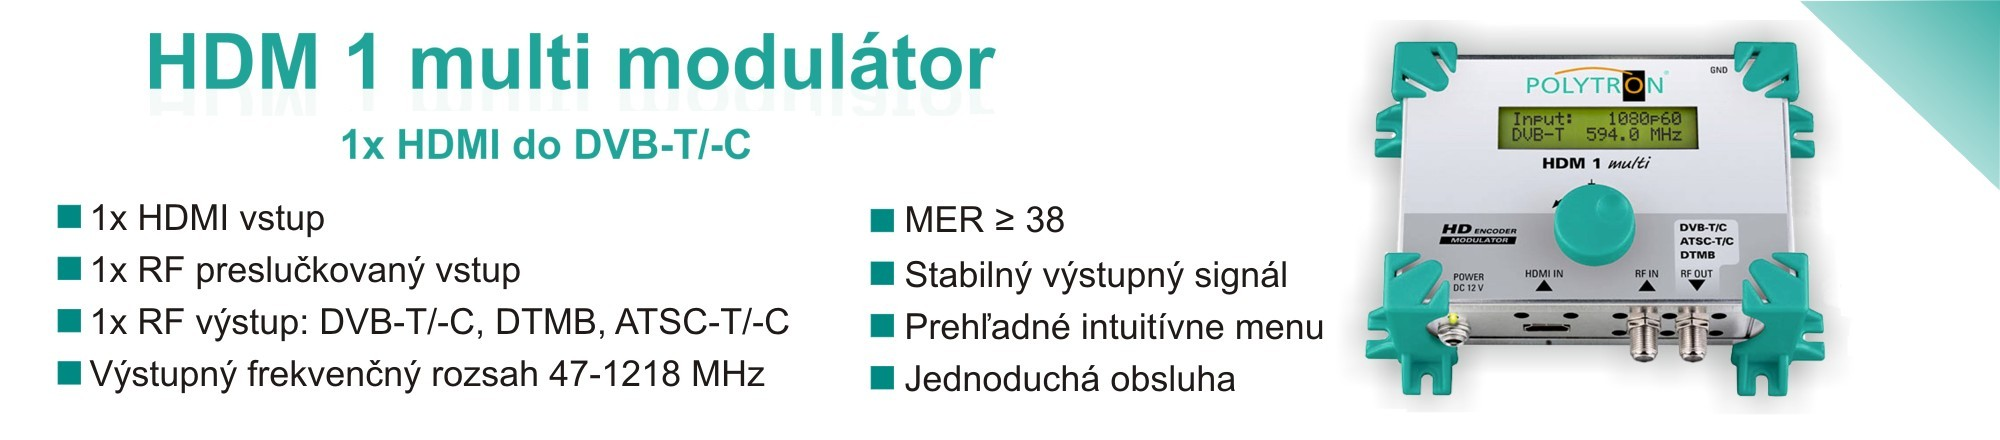 Modulátor HDM 1 multi